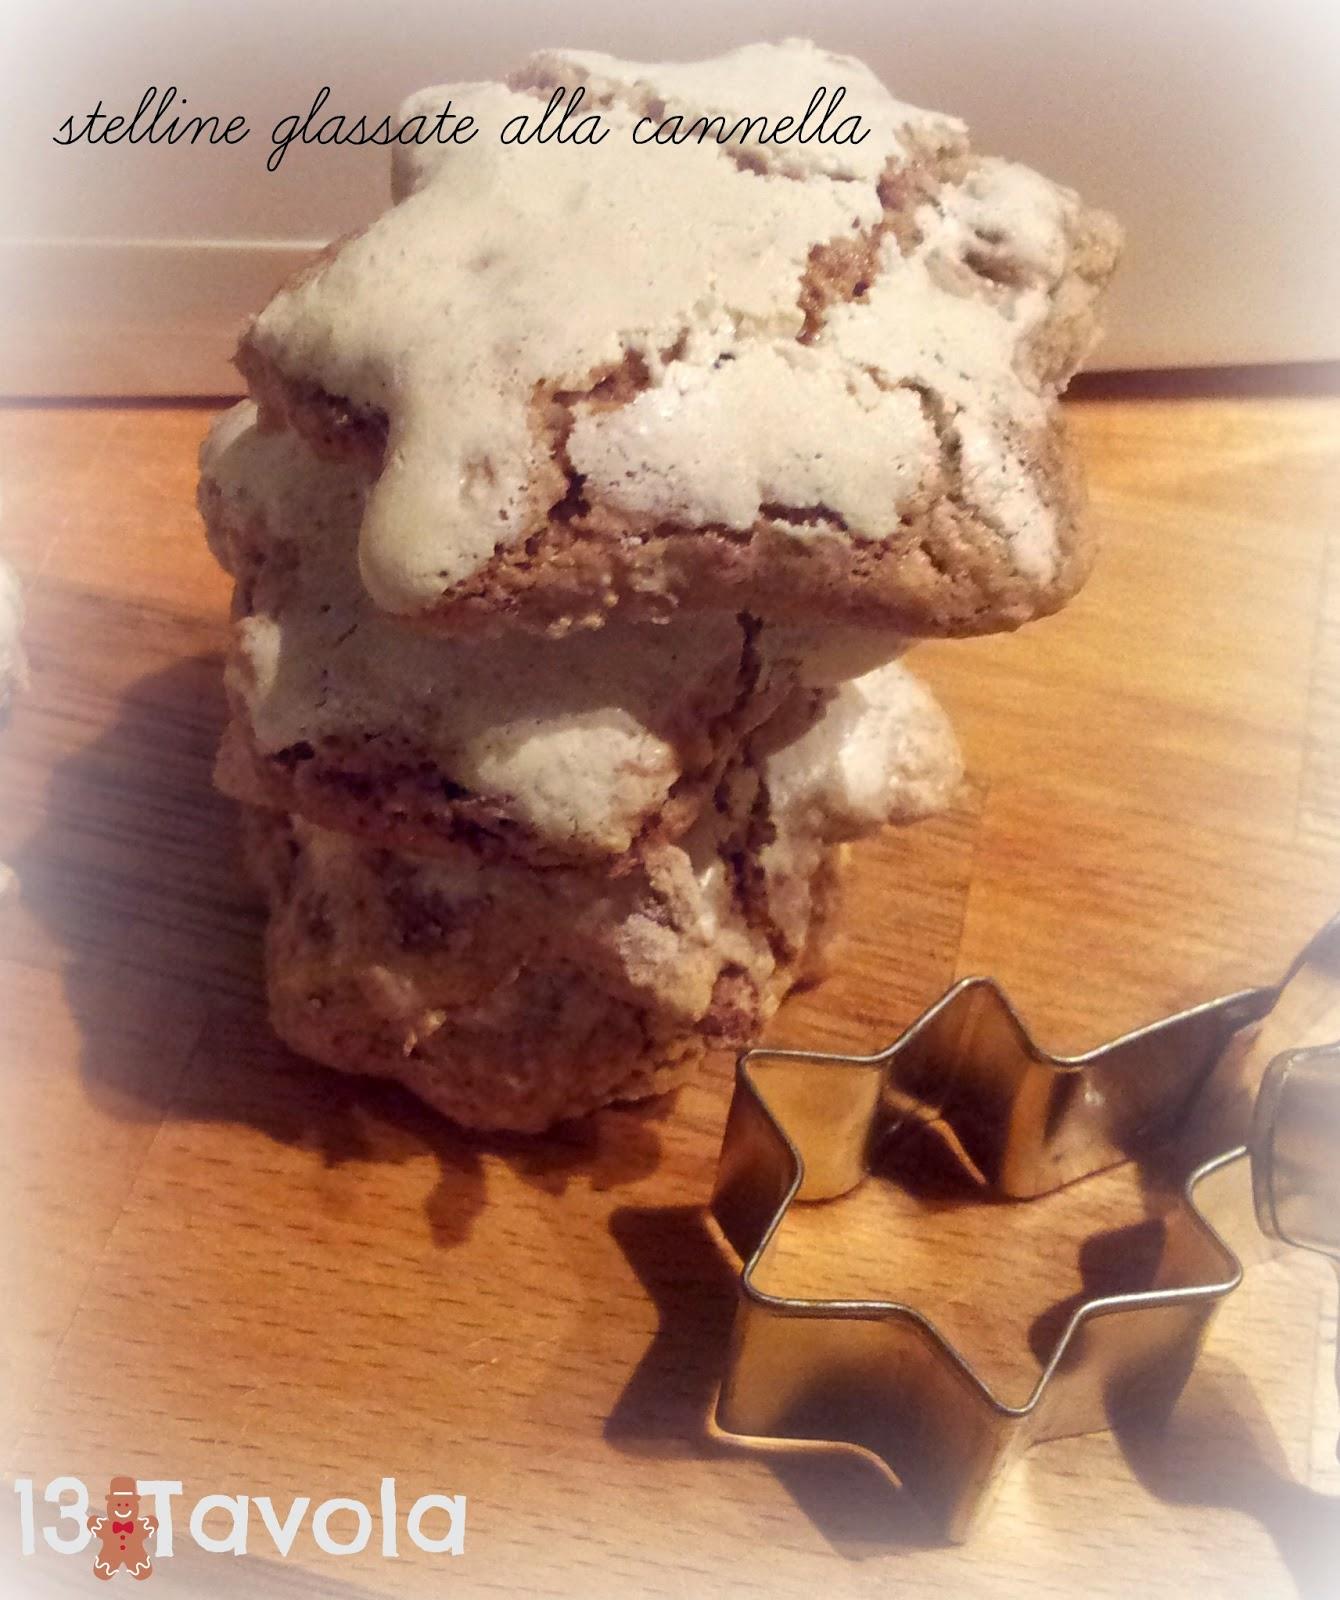 stelline di cannella per i biscotti di natale